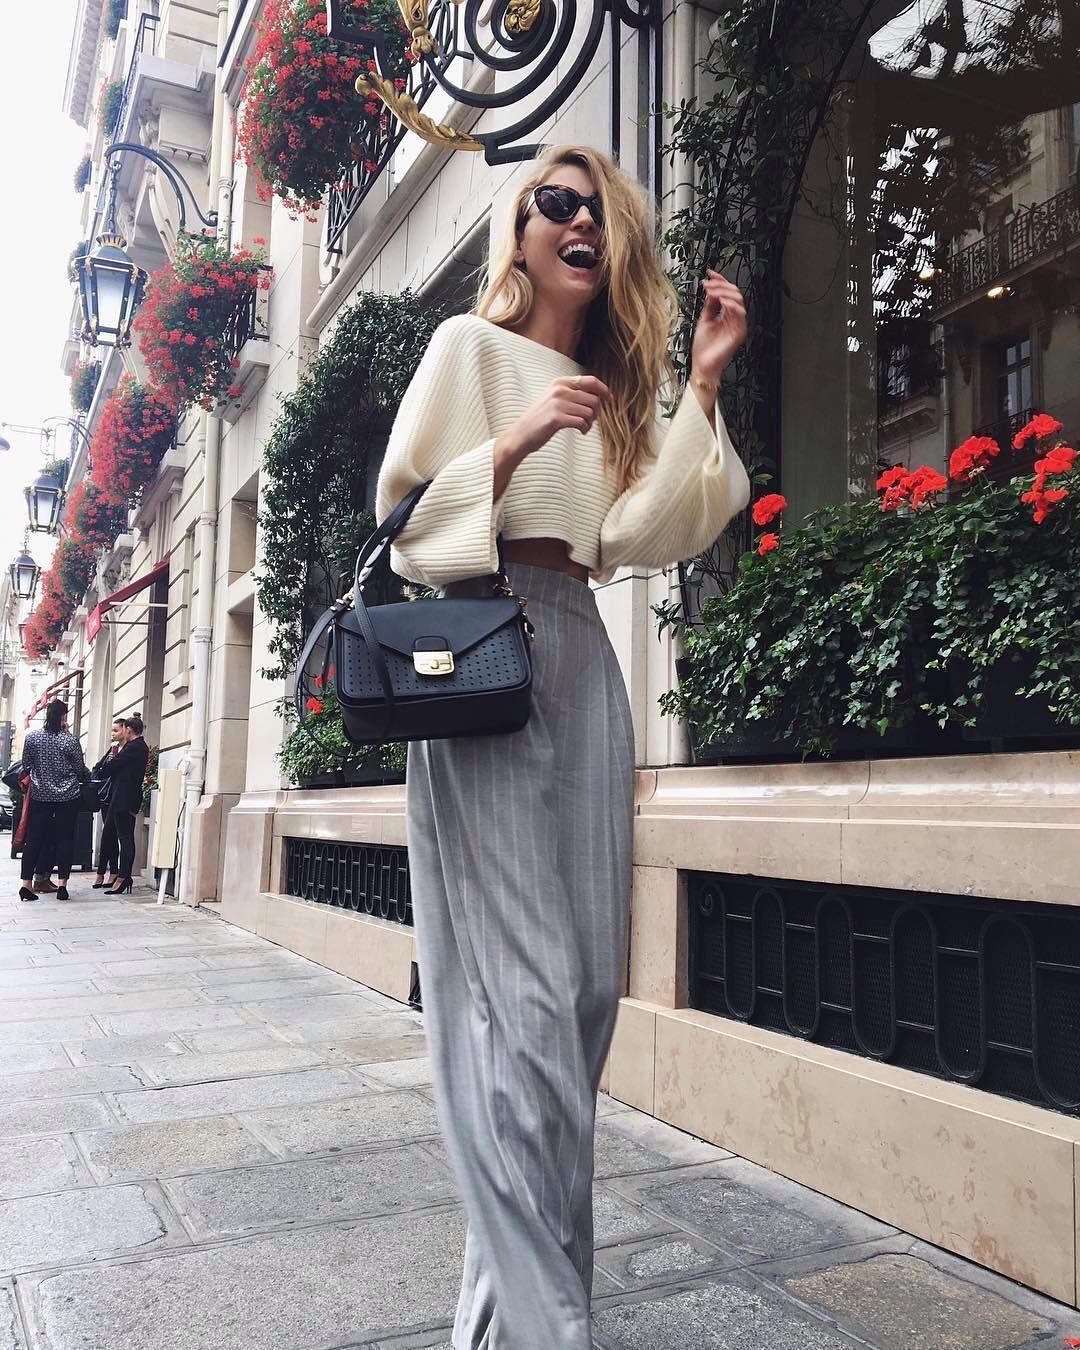 64 Longchamp & Celebrities ideas | longchamp, celebrities, fashion